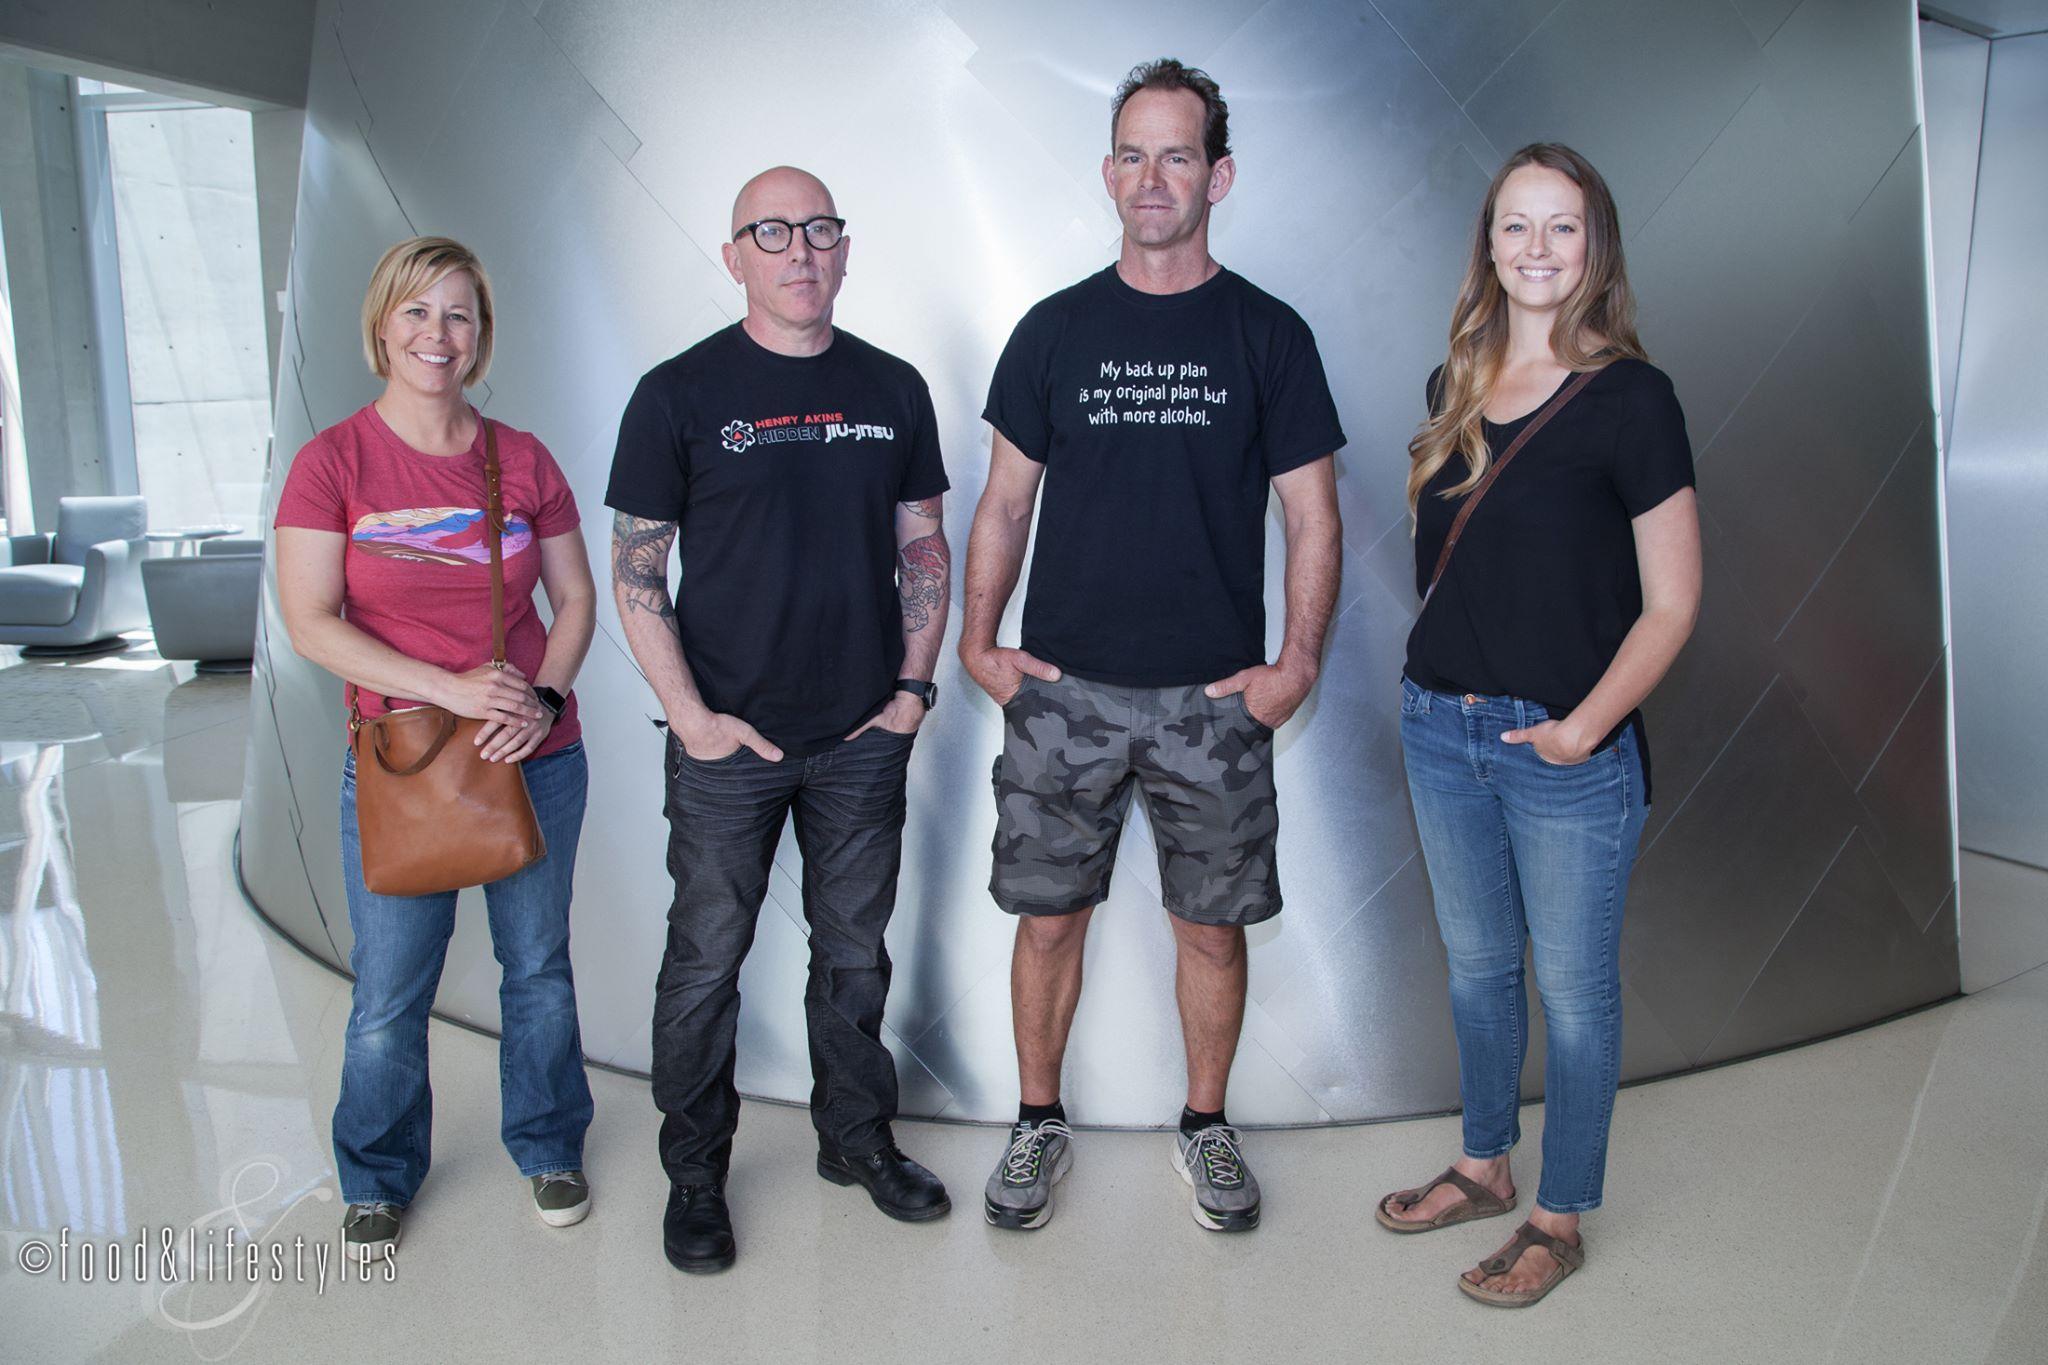 AVA founders Kelly Bostock, Maynard James Keenan, Kent Callaghan, and Sarah Hammelman